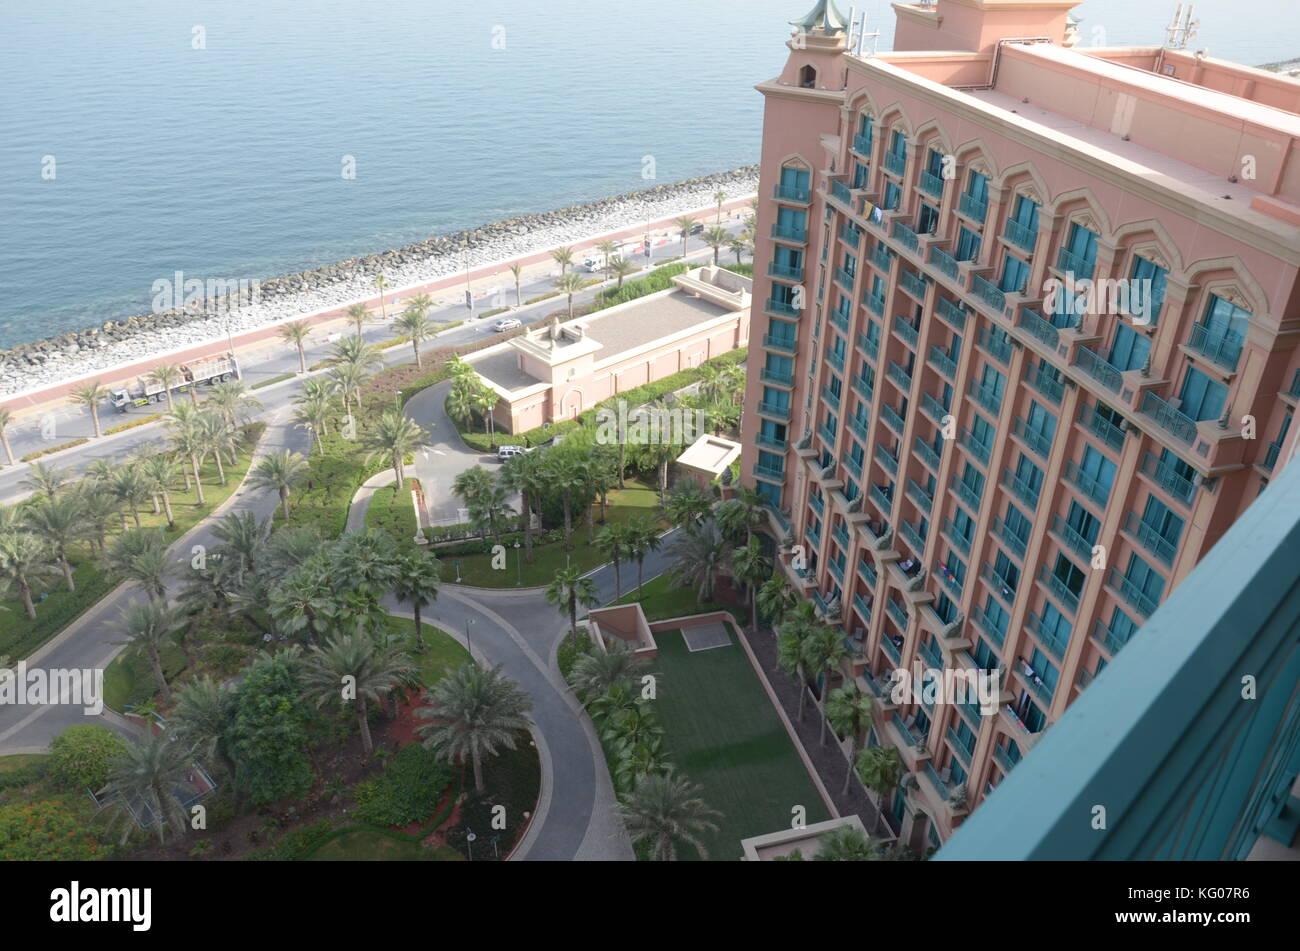 Amazing sea view from the 18th floor of Atlantis the Palm Dubai Stock Photo